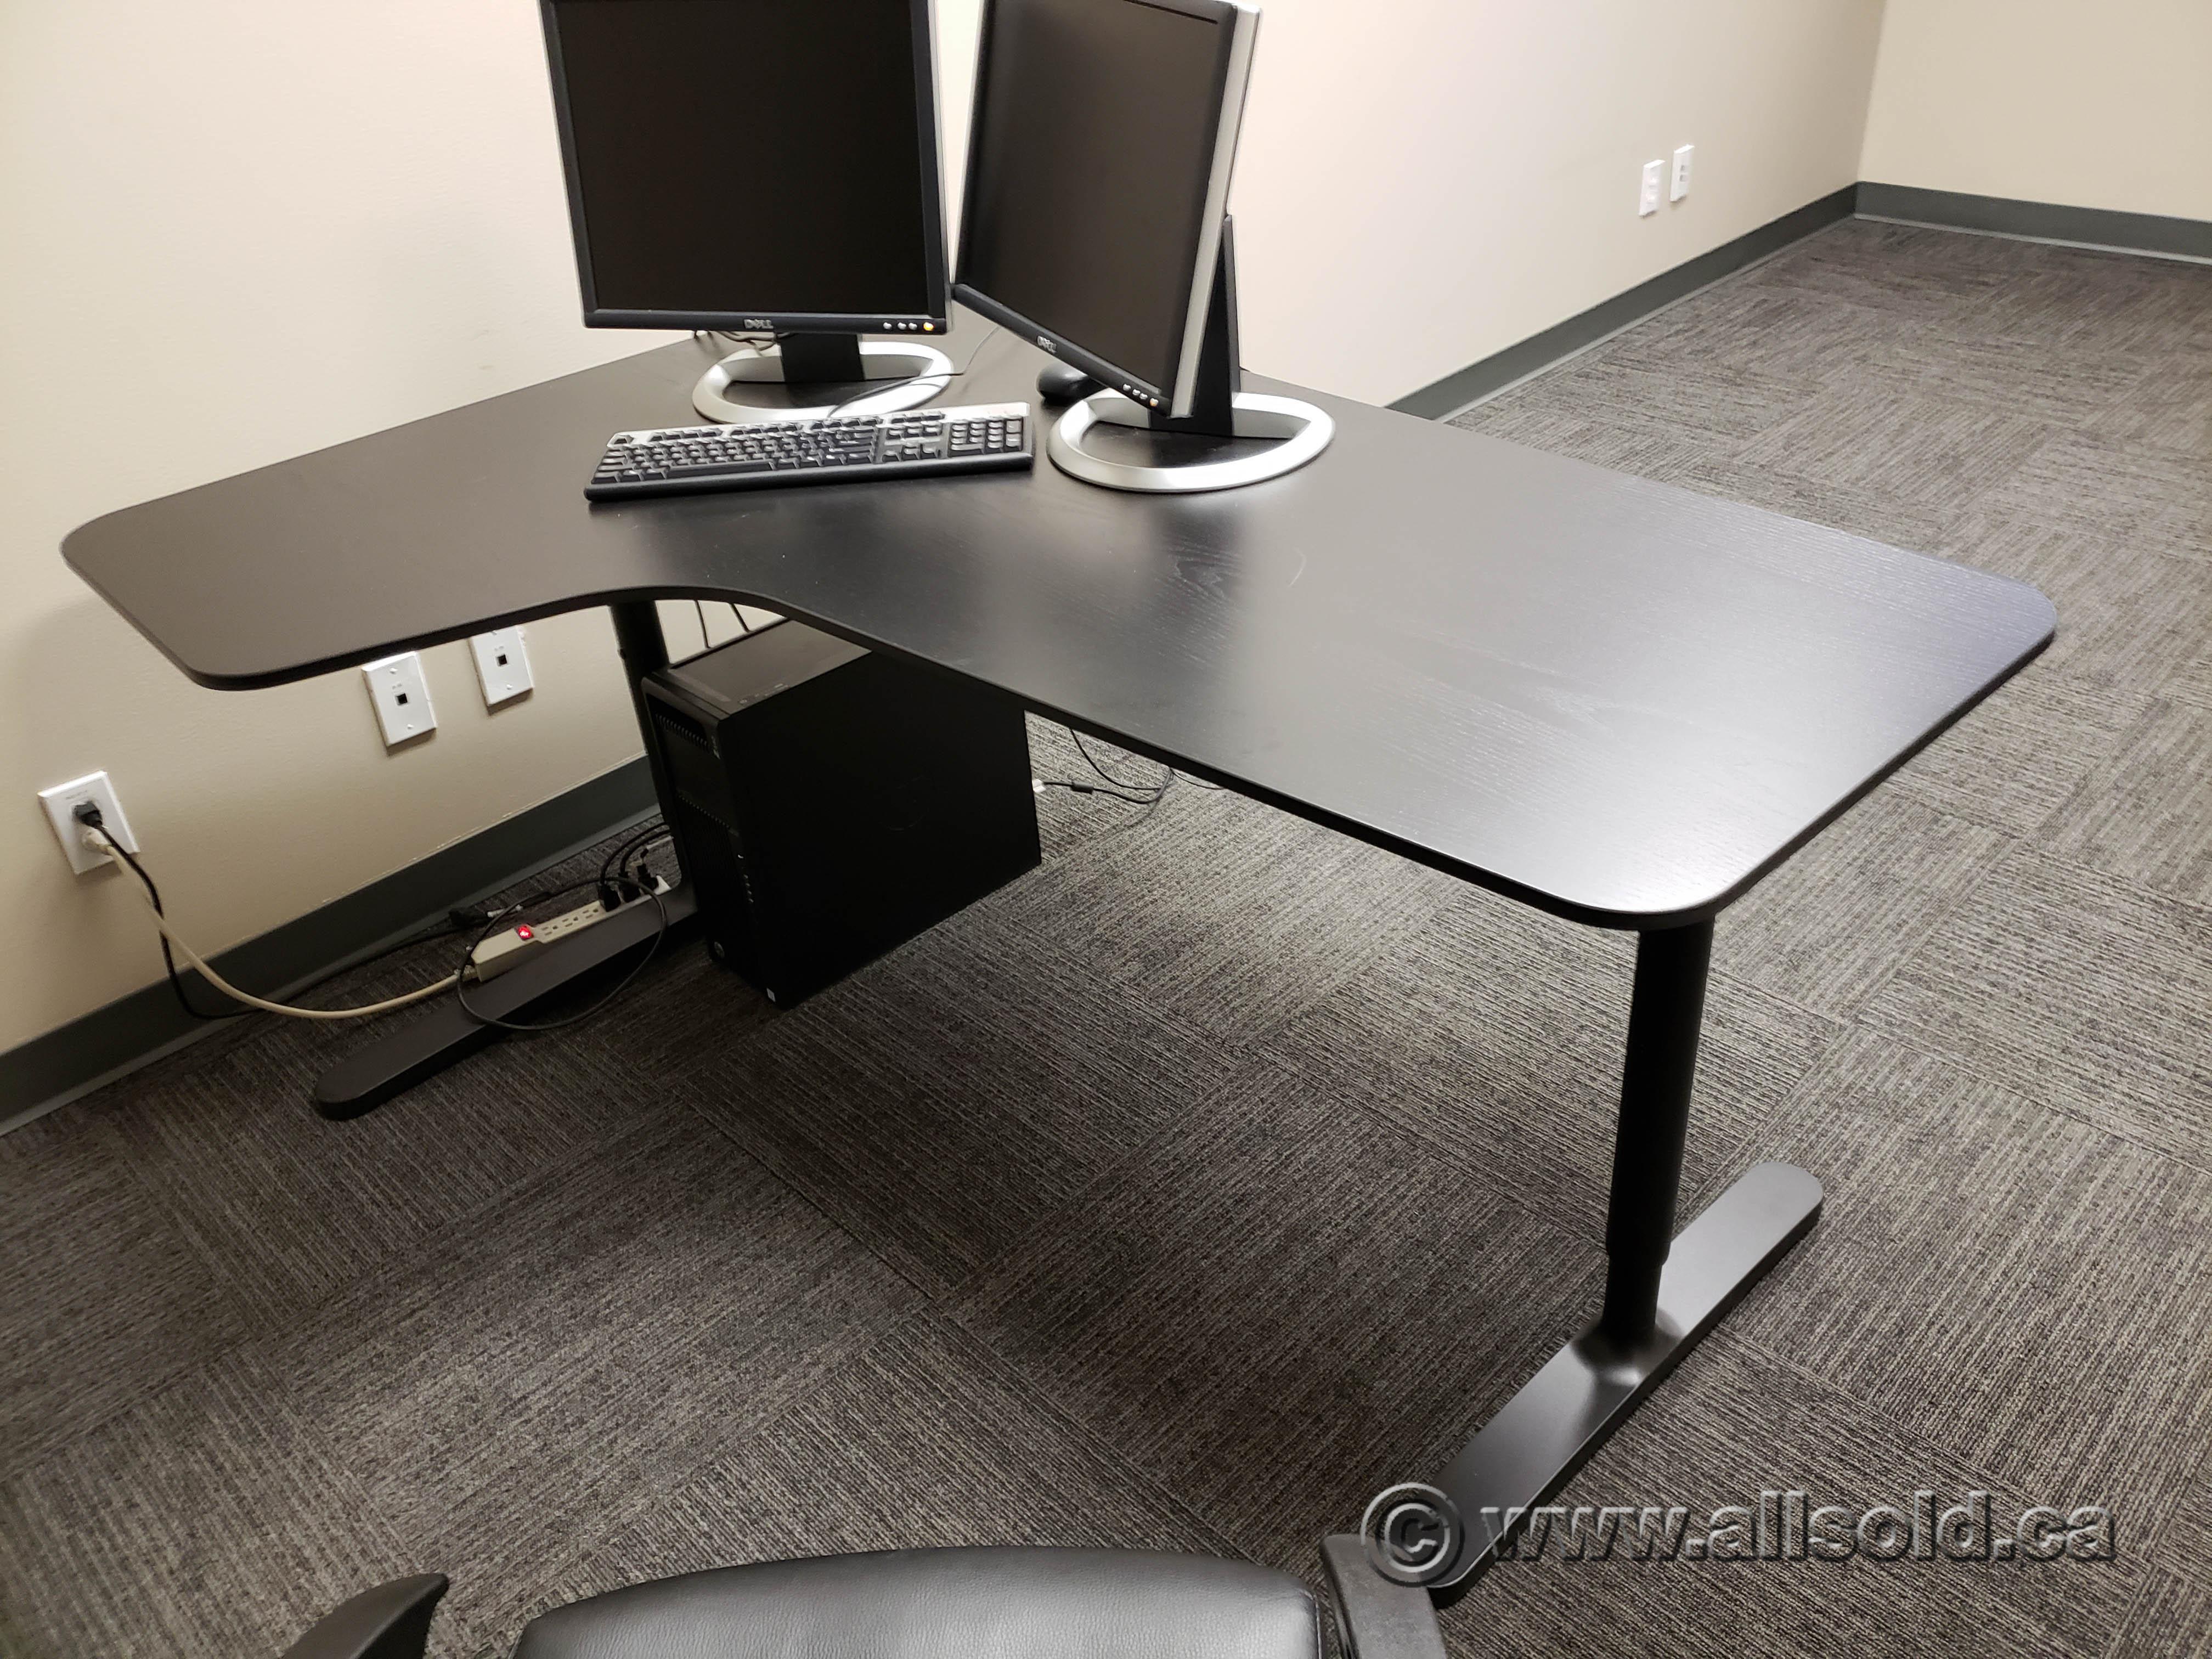 Used Office Desks Calgary M271 Store M271 Store